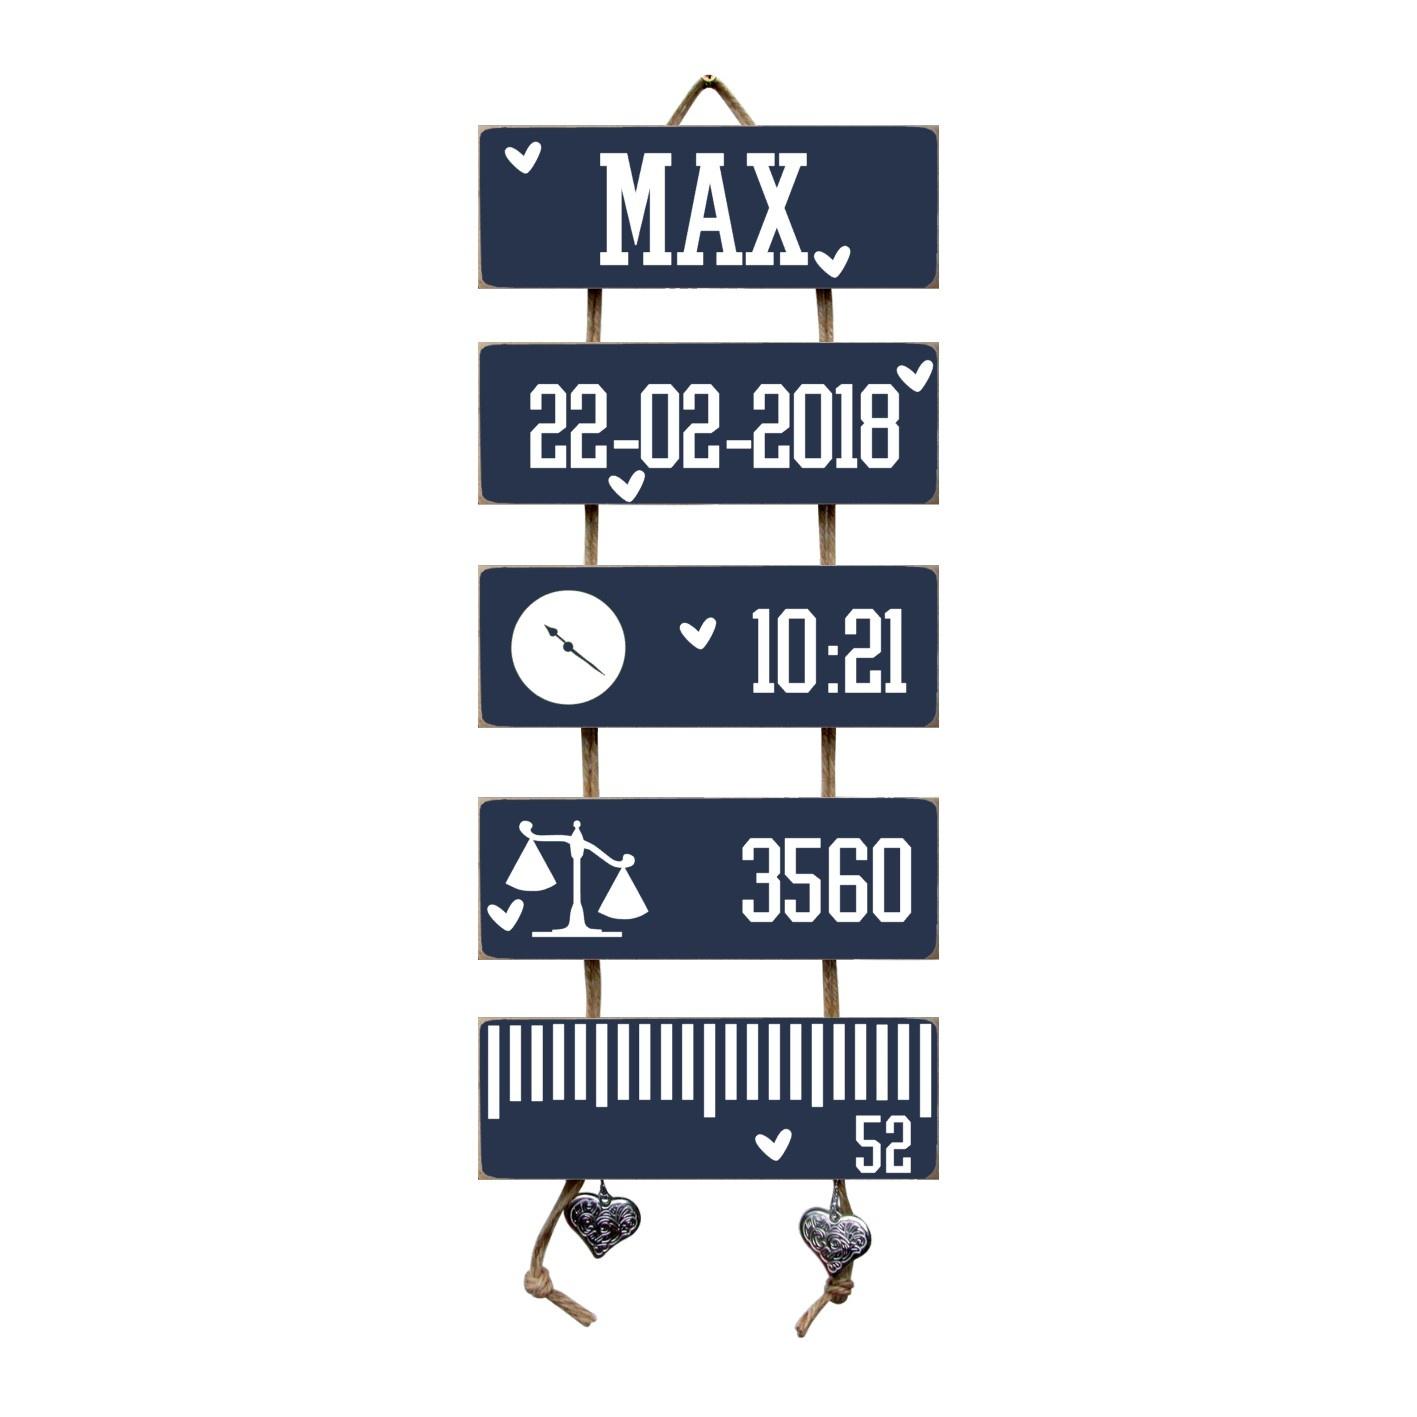 Kraamcadeau Geboorteladder Max donkerblauw